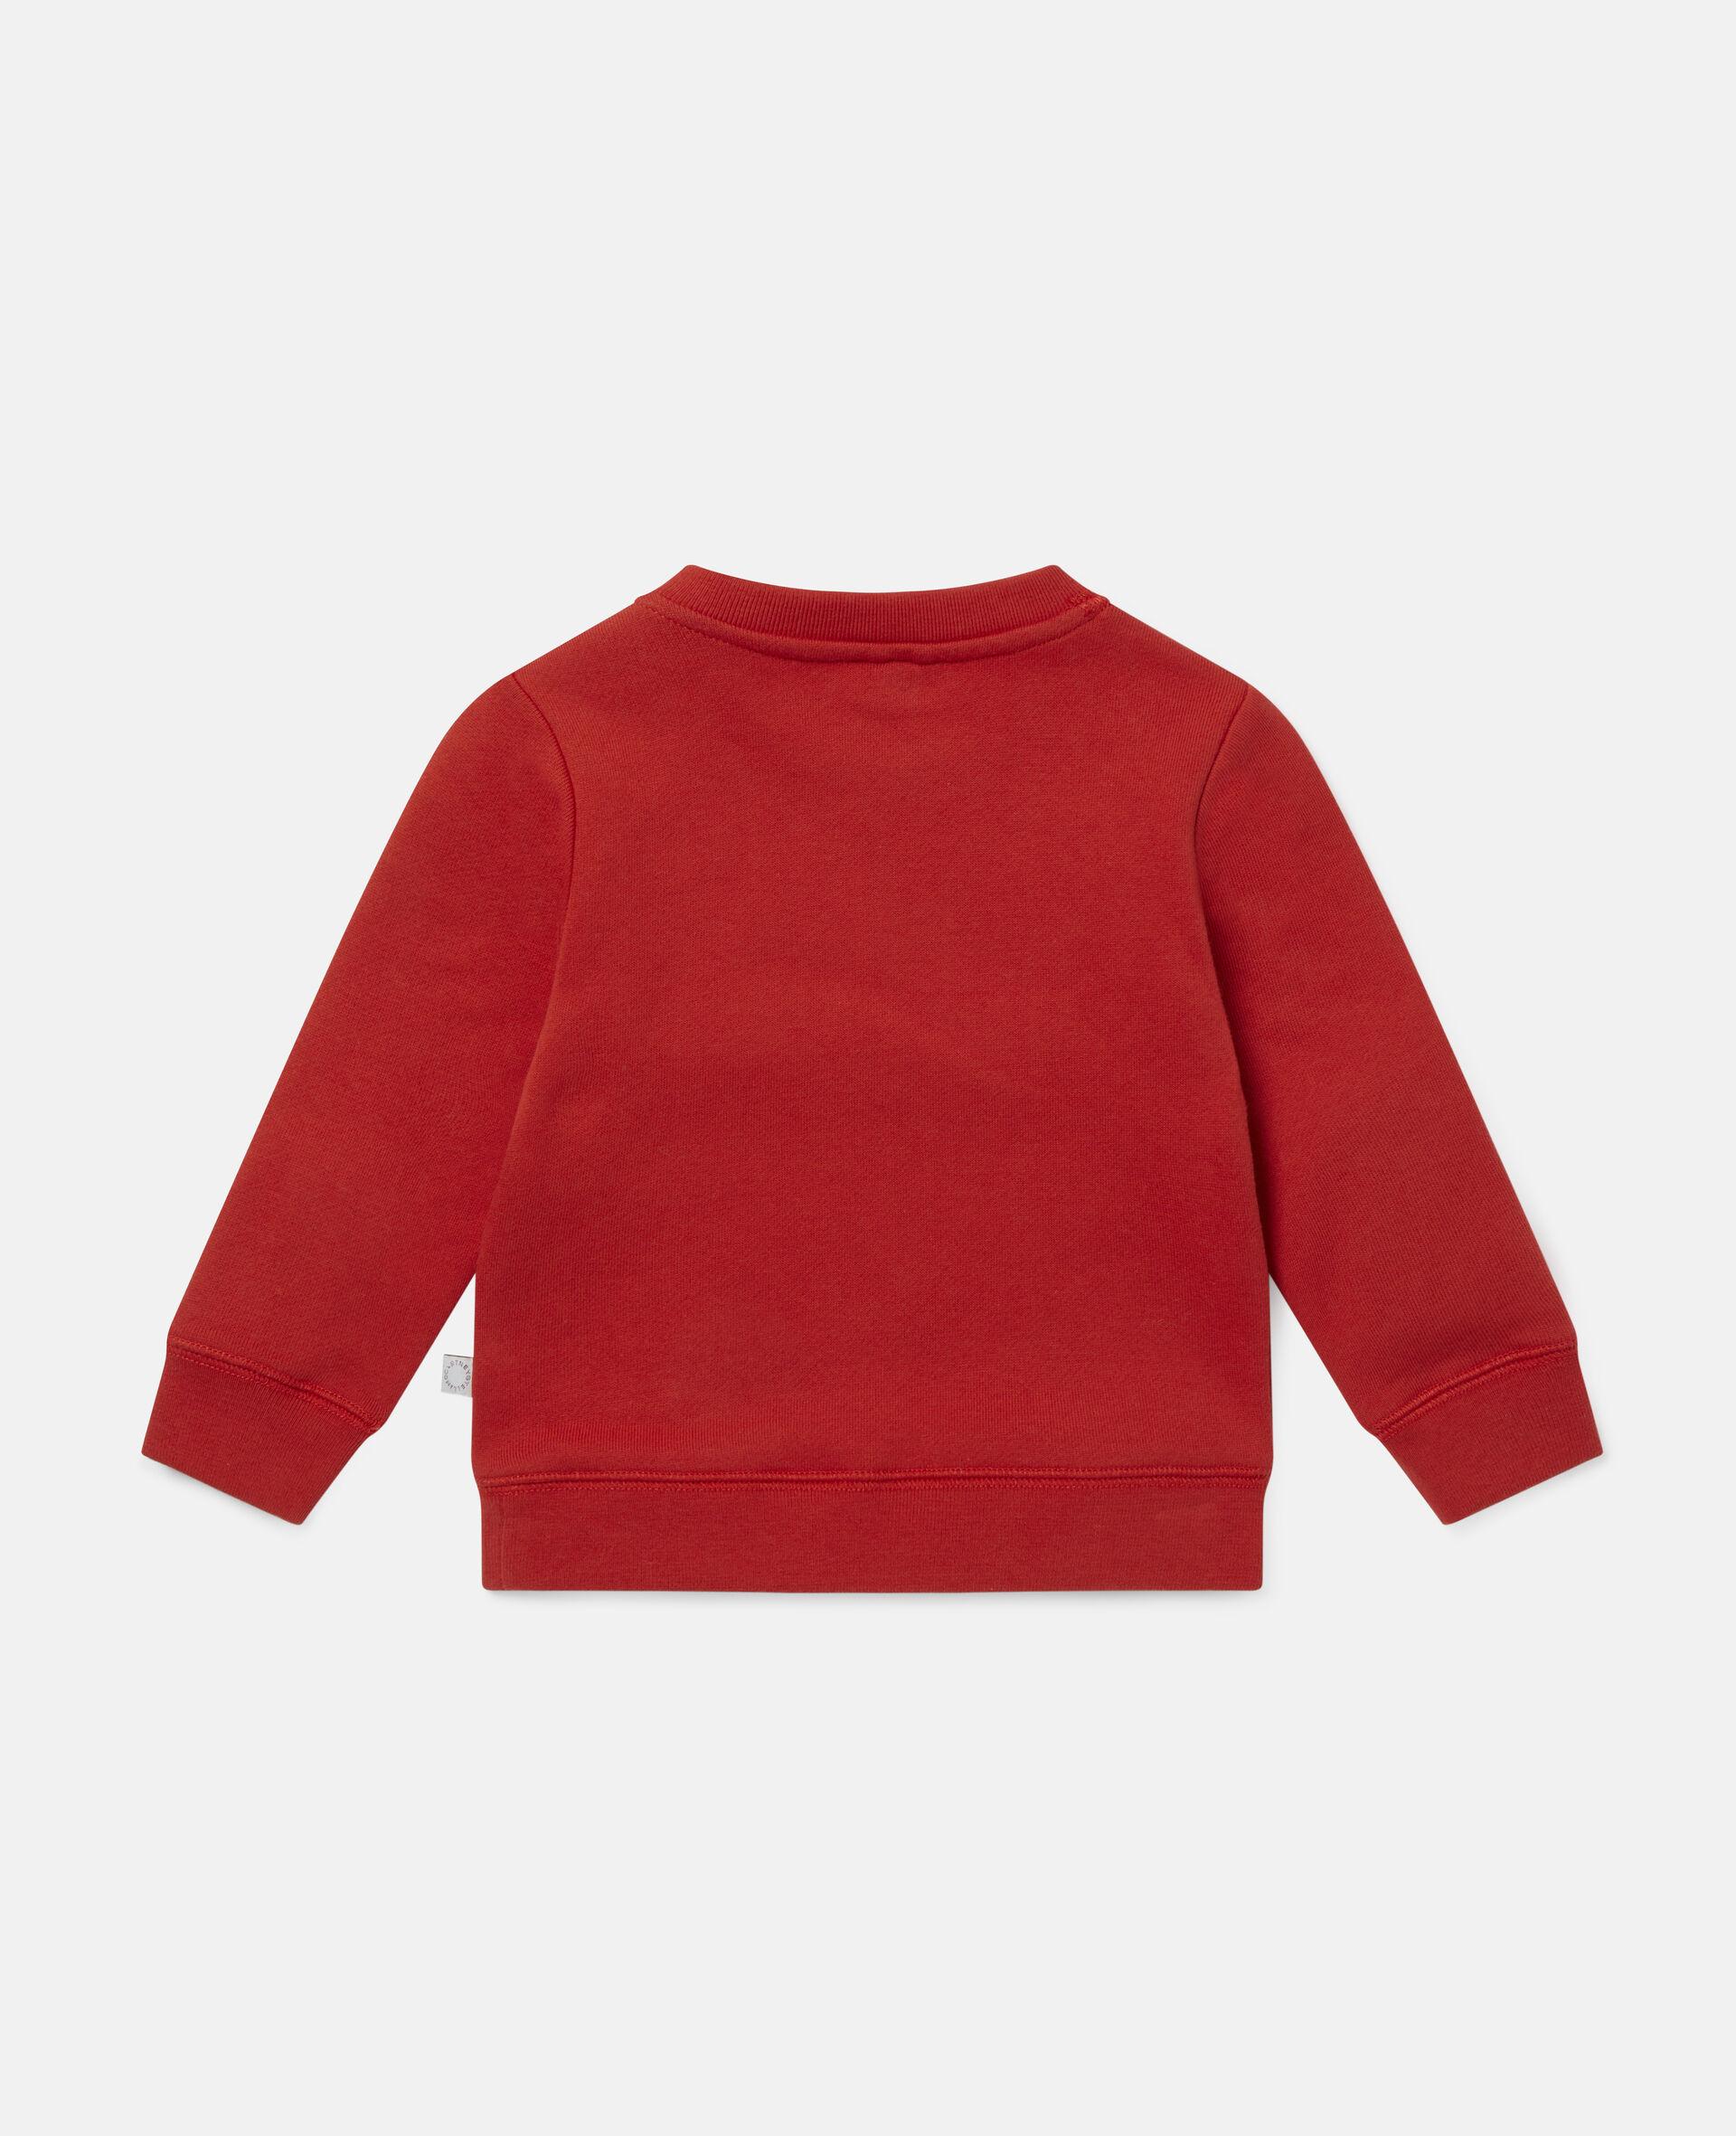 Rainbow Painting Tubes Fleece Sweatshirt-Red-large image number 3